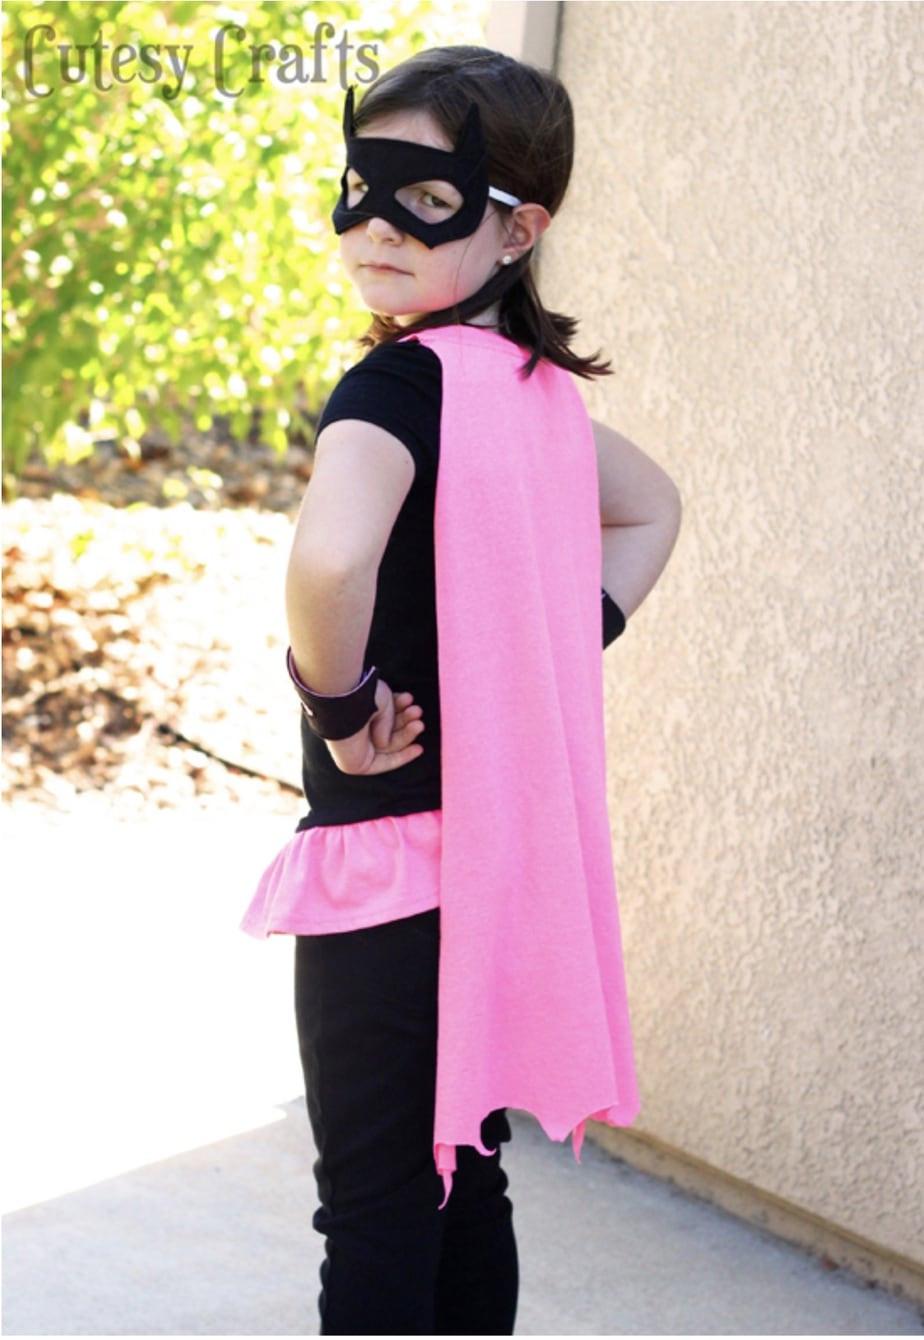 Superhero Costume DIY  DIY Superhero Costumes Cutesy Crafts